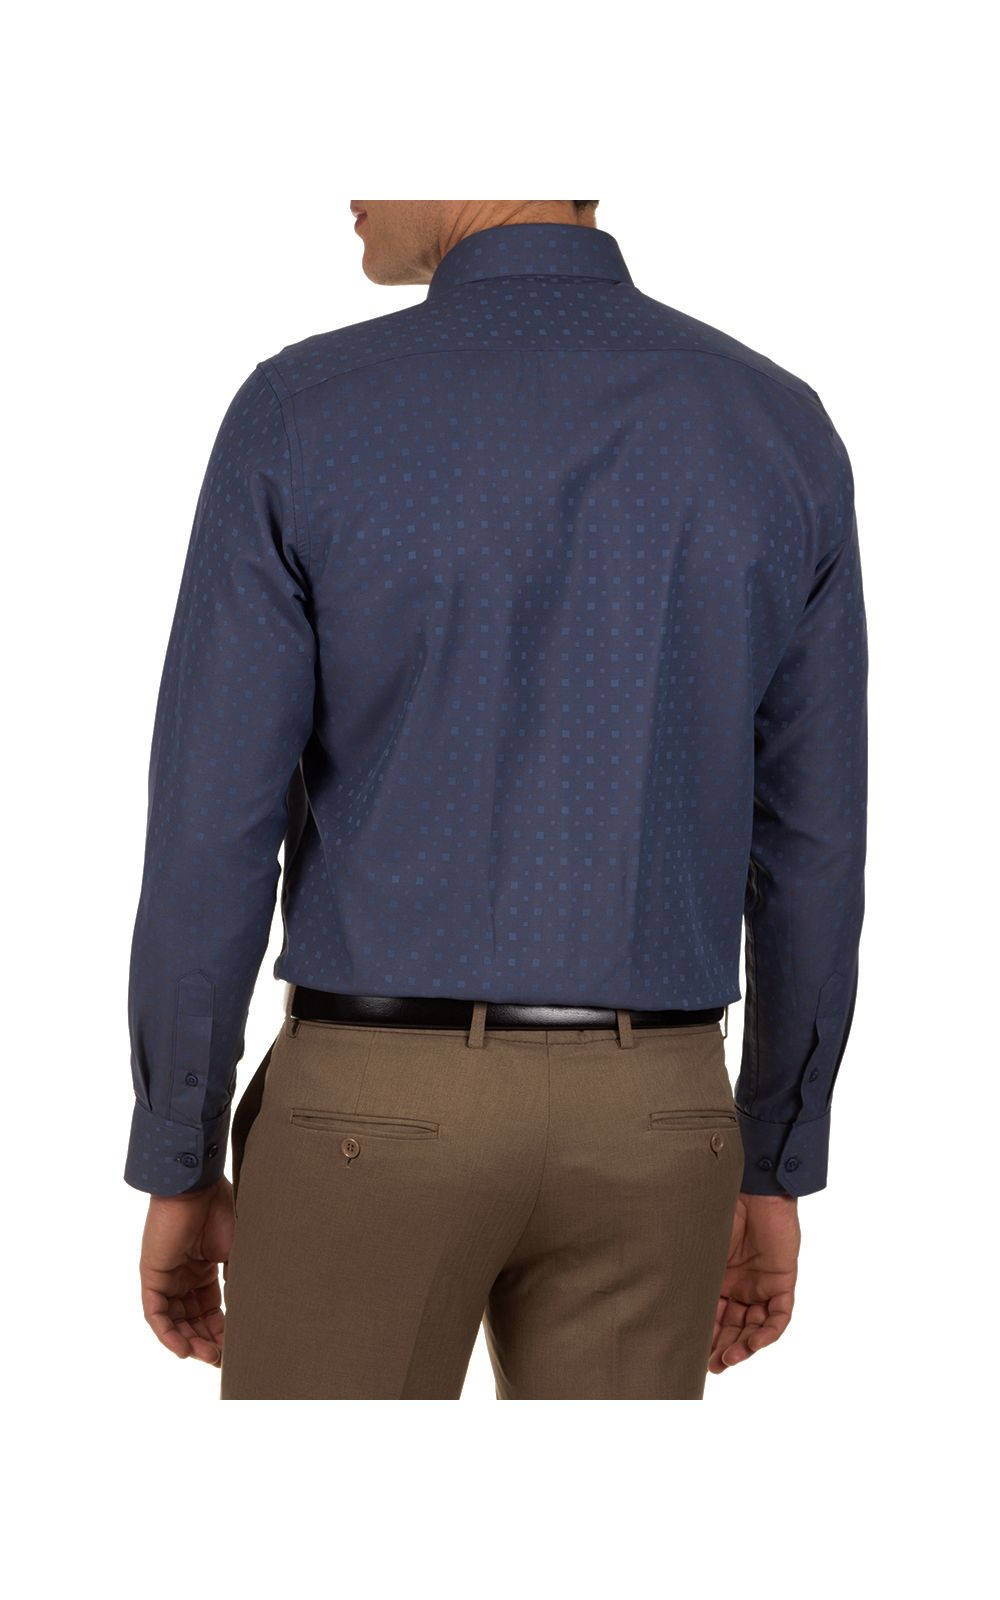 Foto 2 - Camisa Social Masculina Azul Detalhada